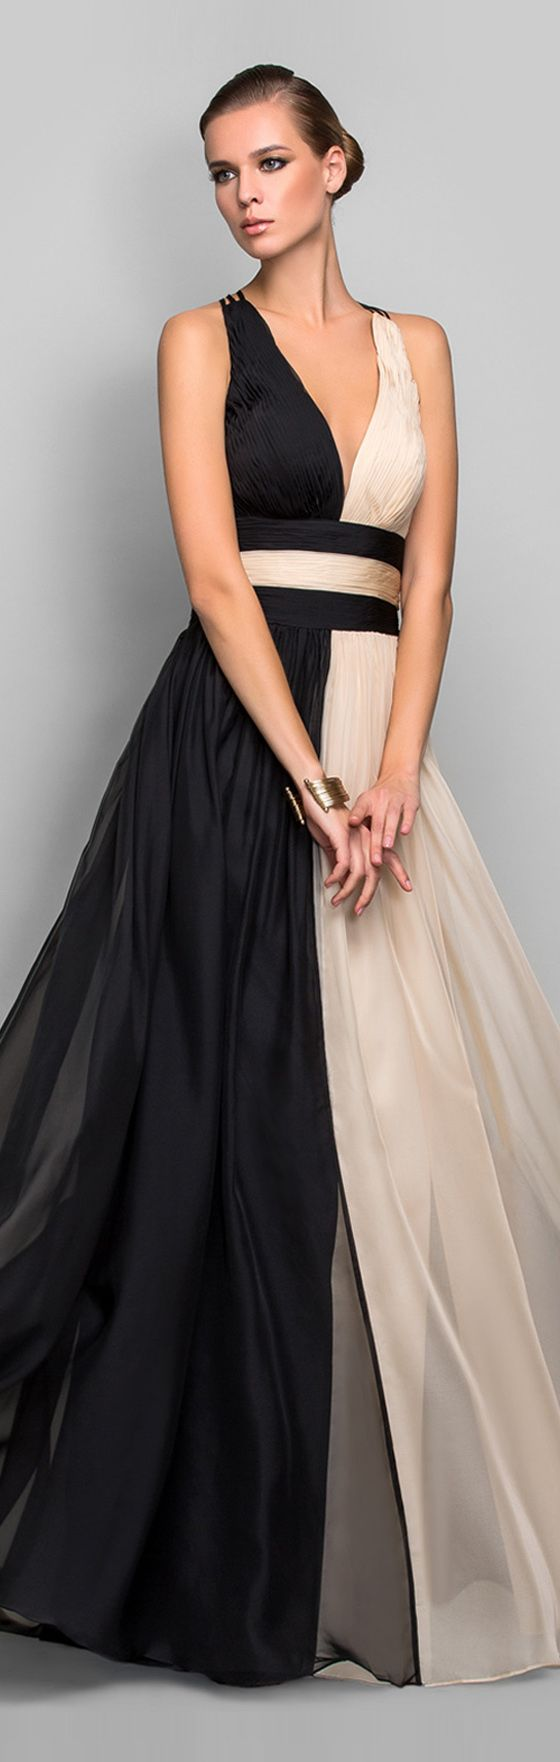 best dresses images on pinterest ombre prom dresses prom